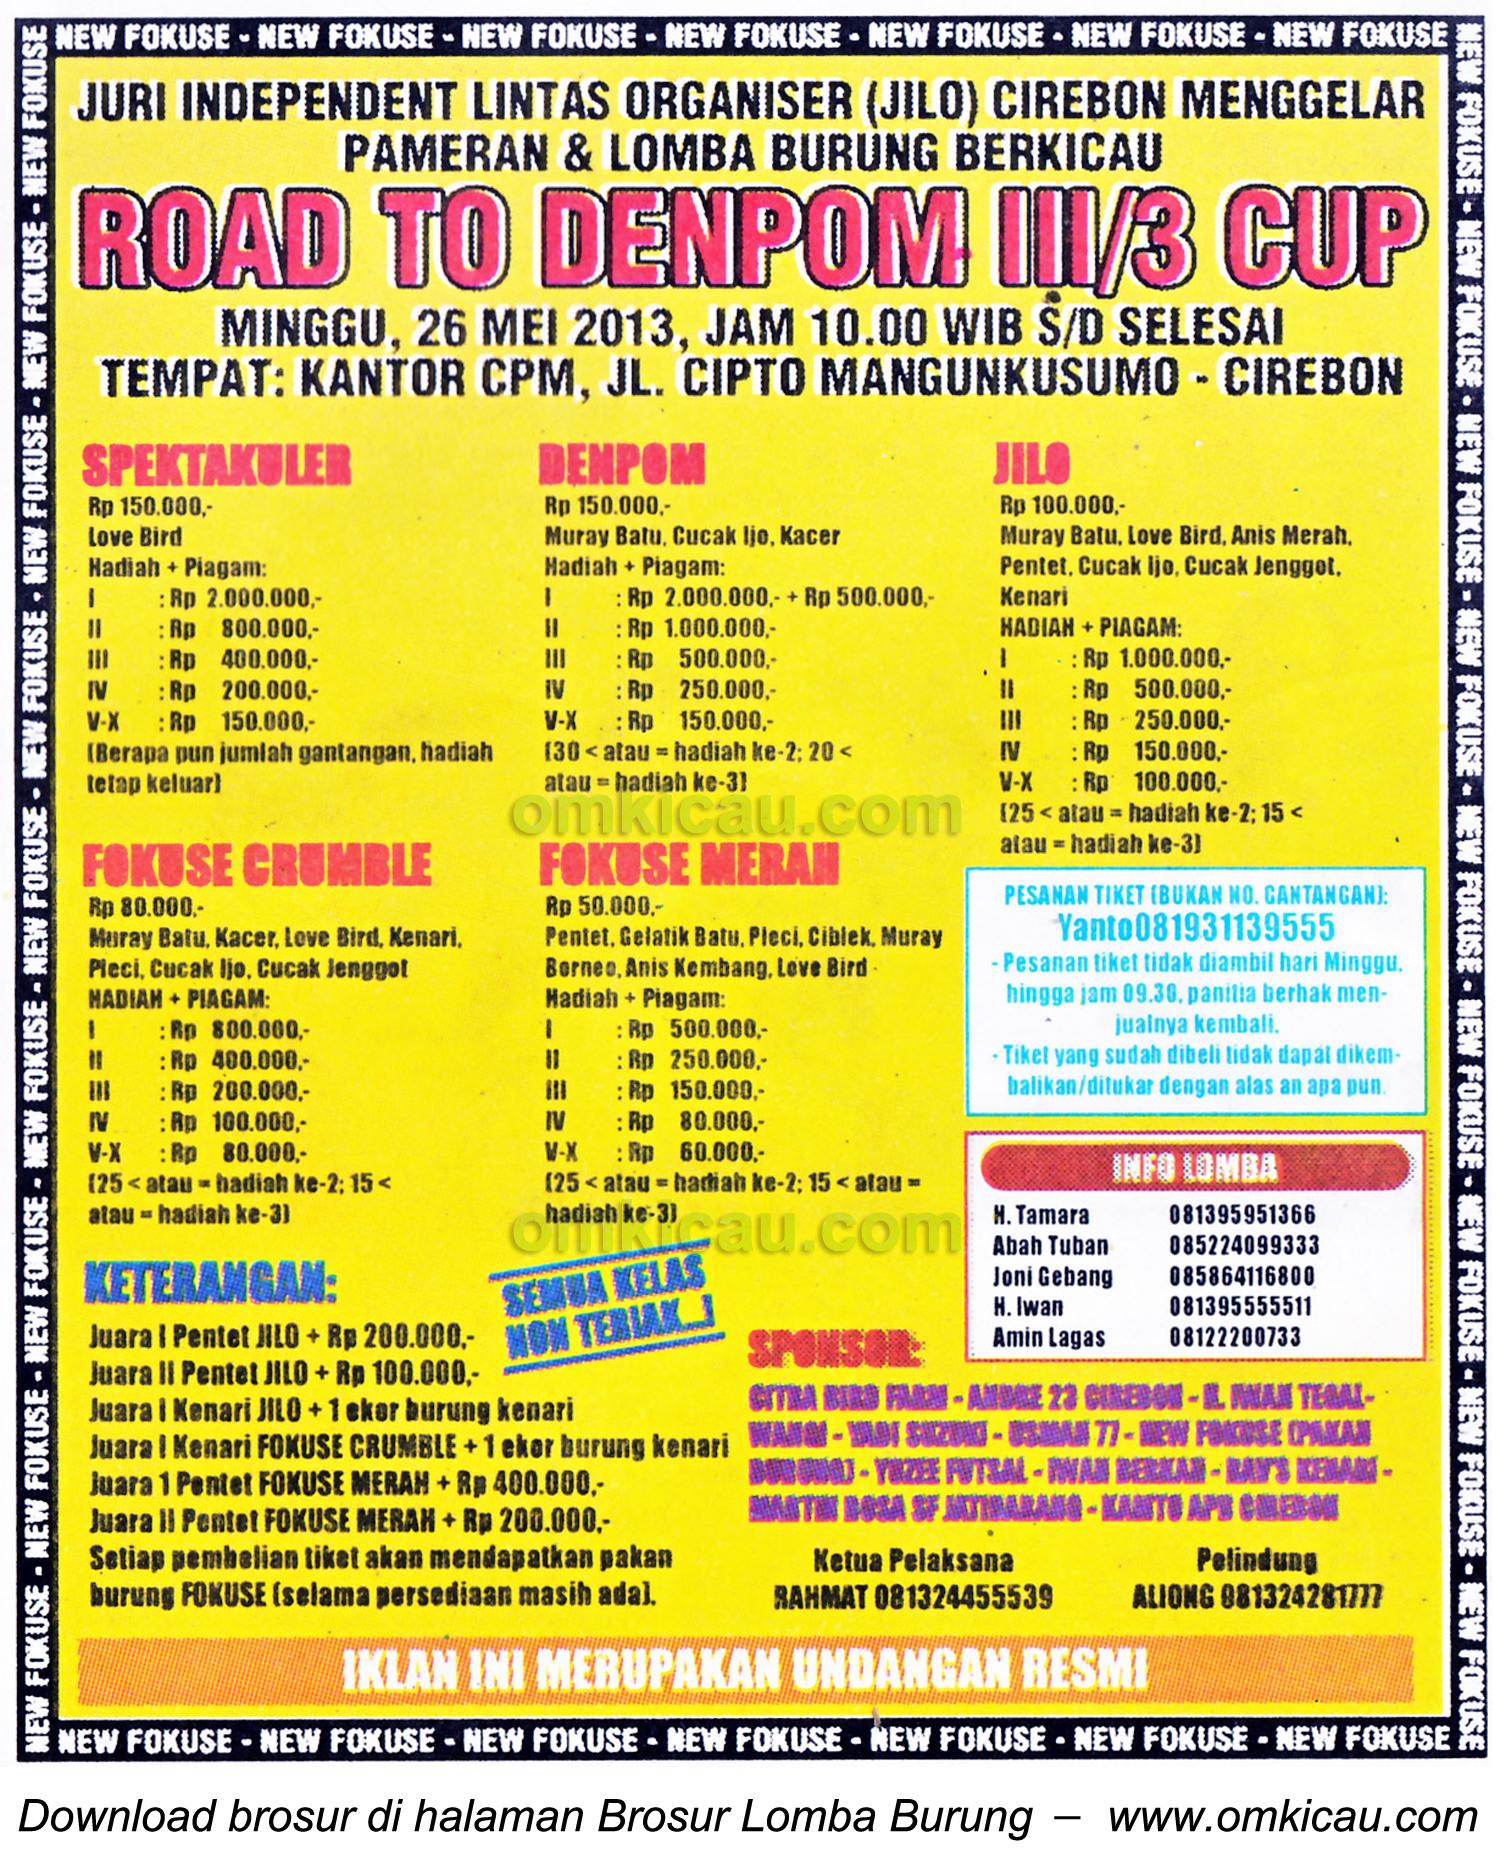 Brosur Lomba Burung Road to Denpom III Cup